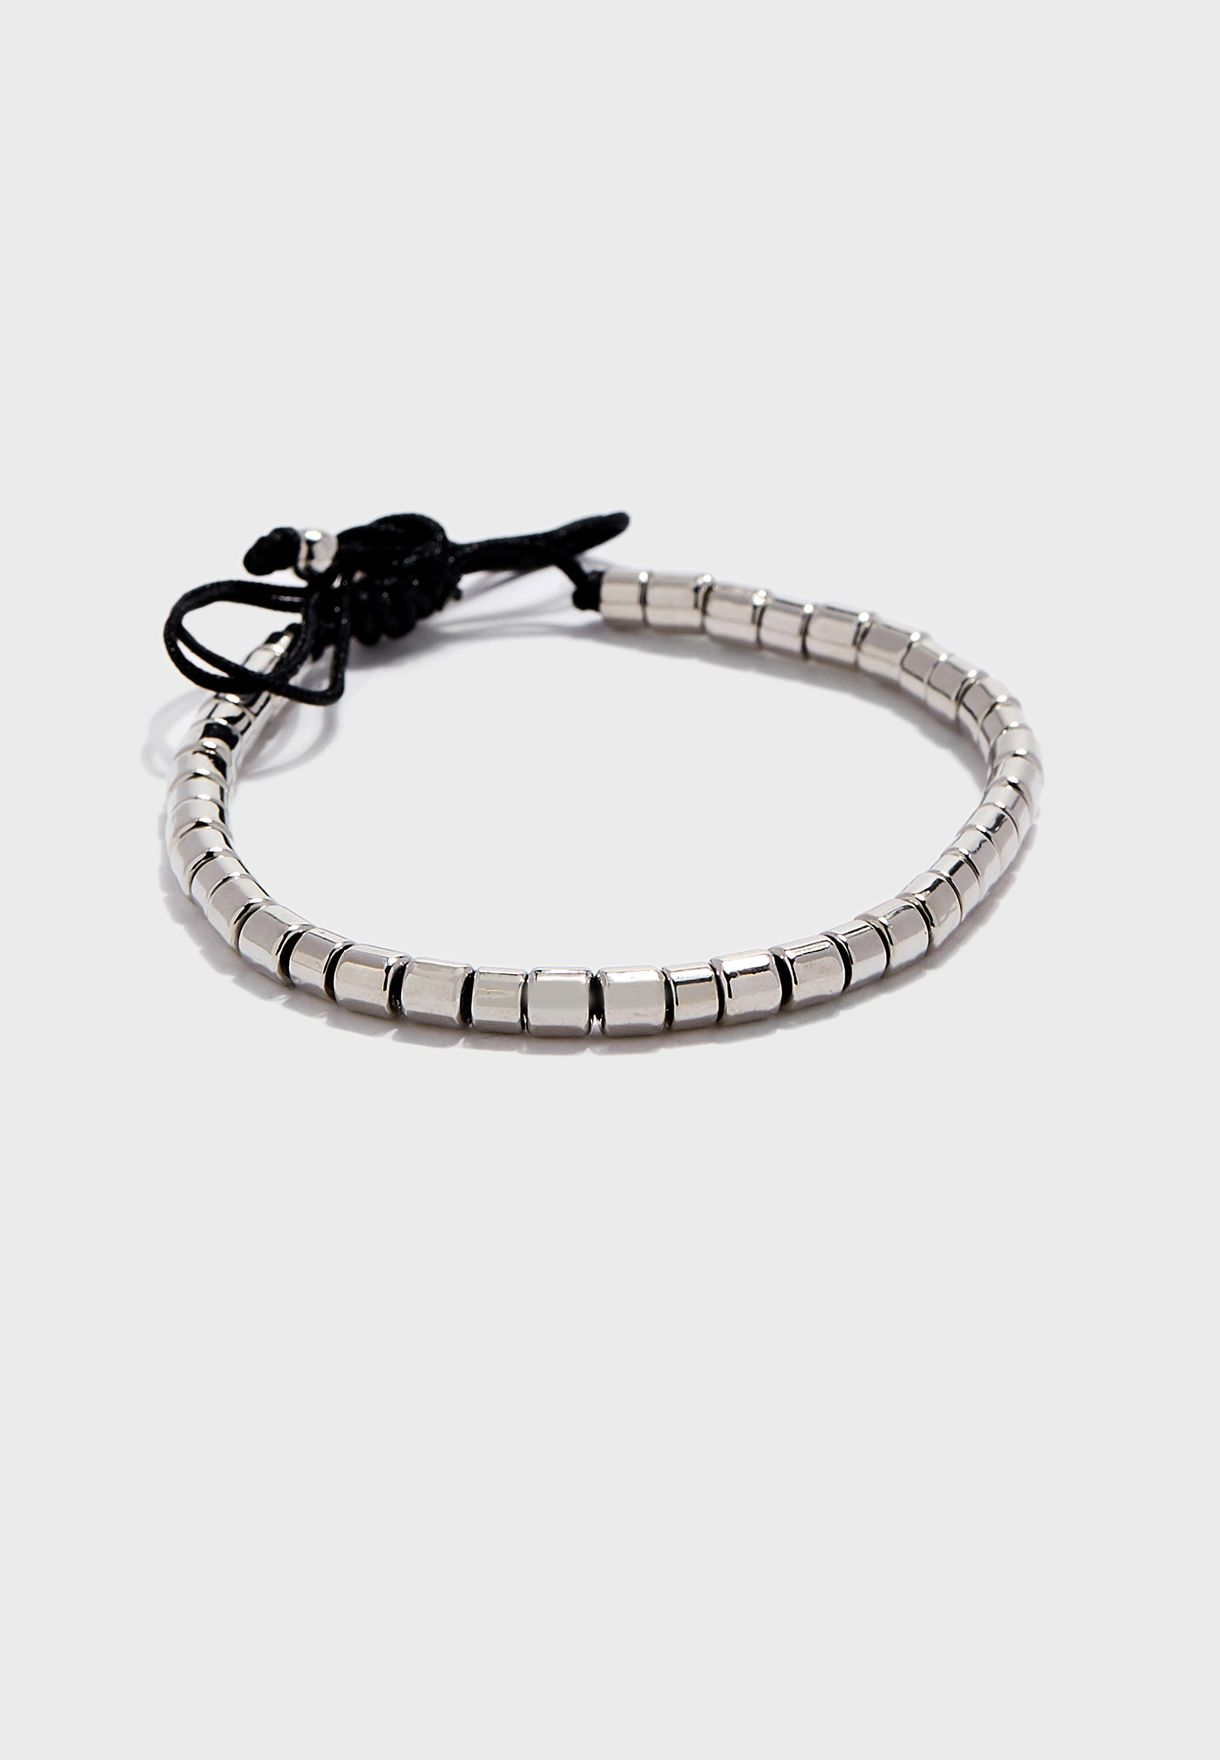 Logan Barrel Bead Bracelet